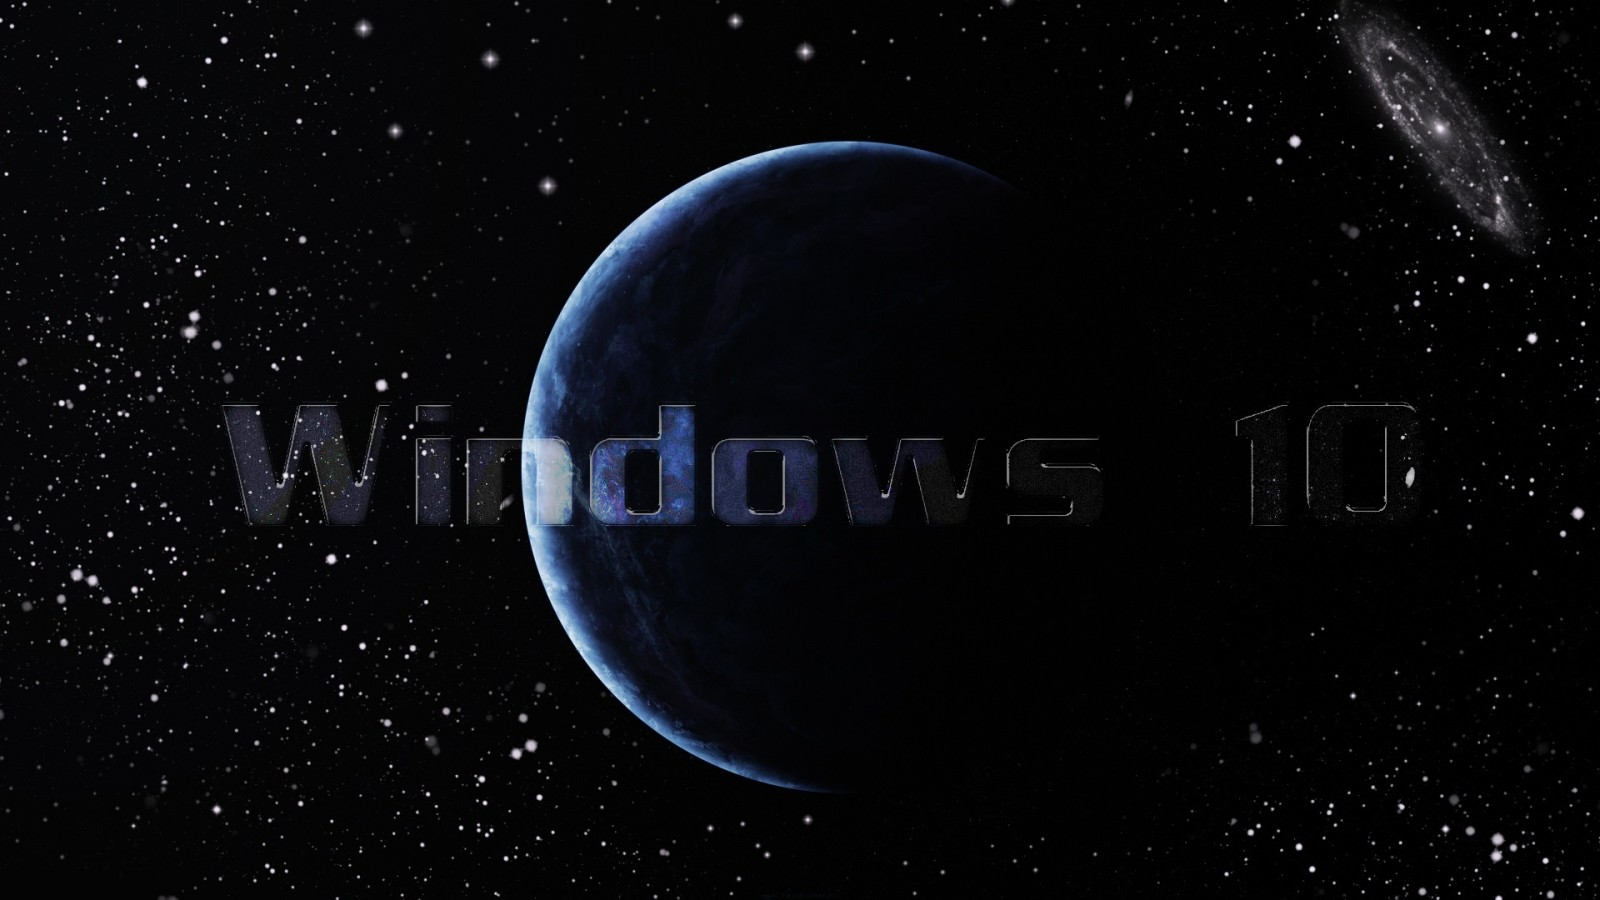 Windows 10 Galaxy wallpaper 1600x900   Wallpaper   Wallpaper Style 1600x900